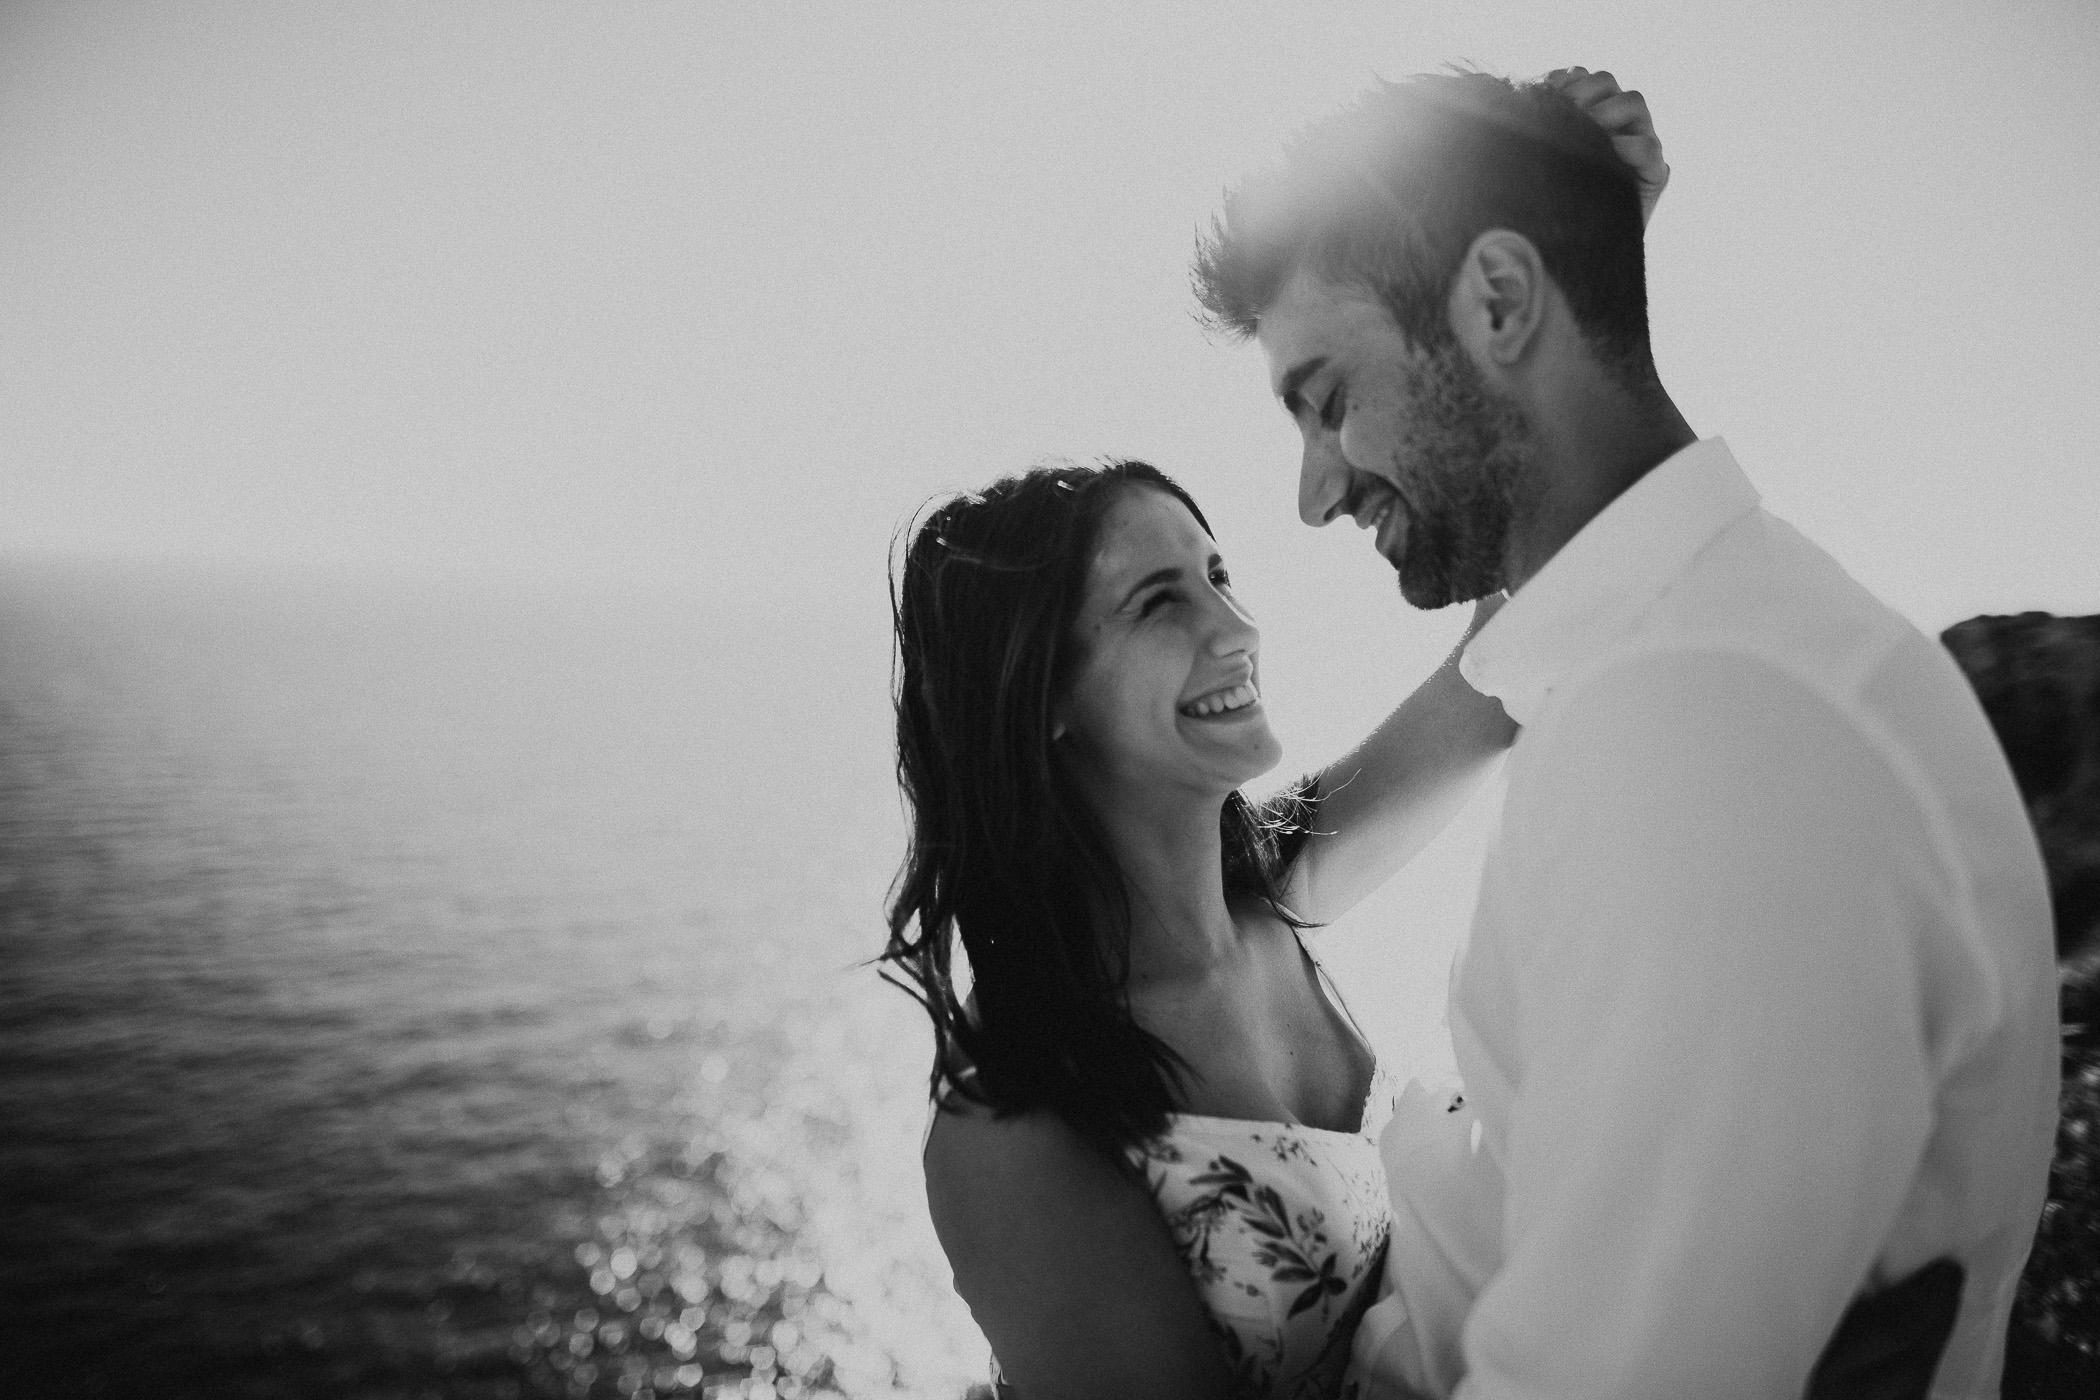 DanielaMarquardtPhotography_wedding_elopement_mallorca_spain_calapi_palma_lauraandtoni_198